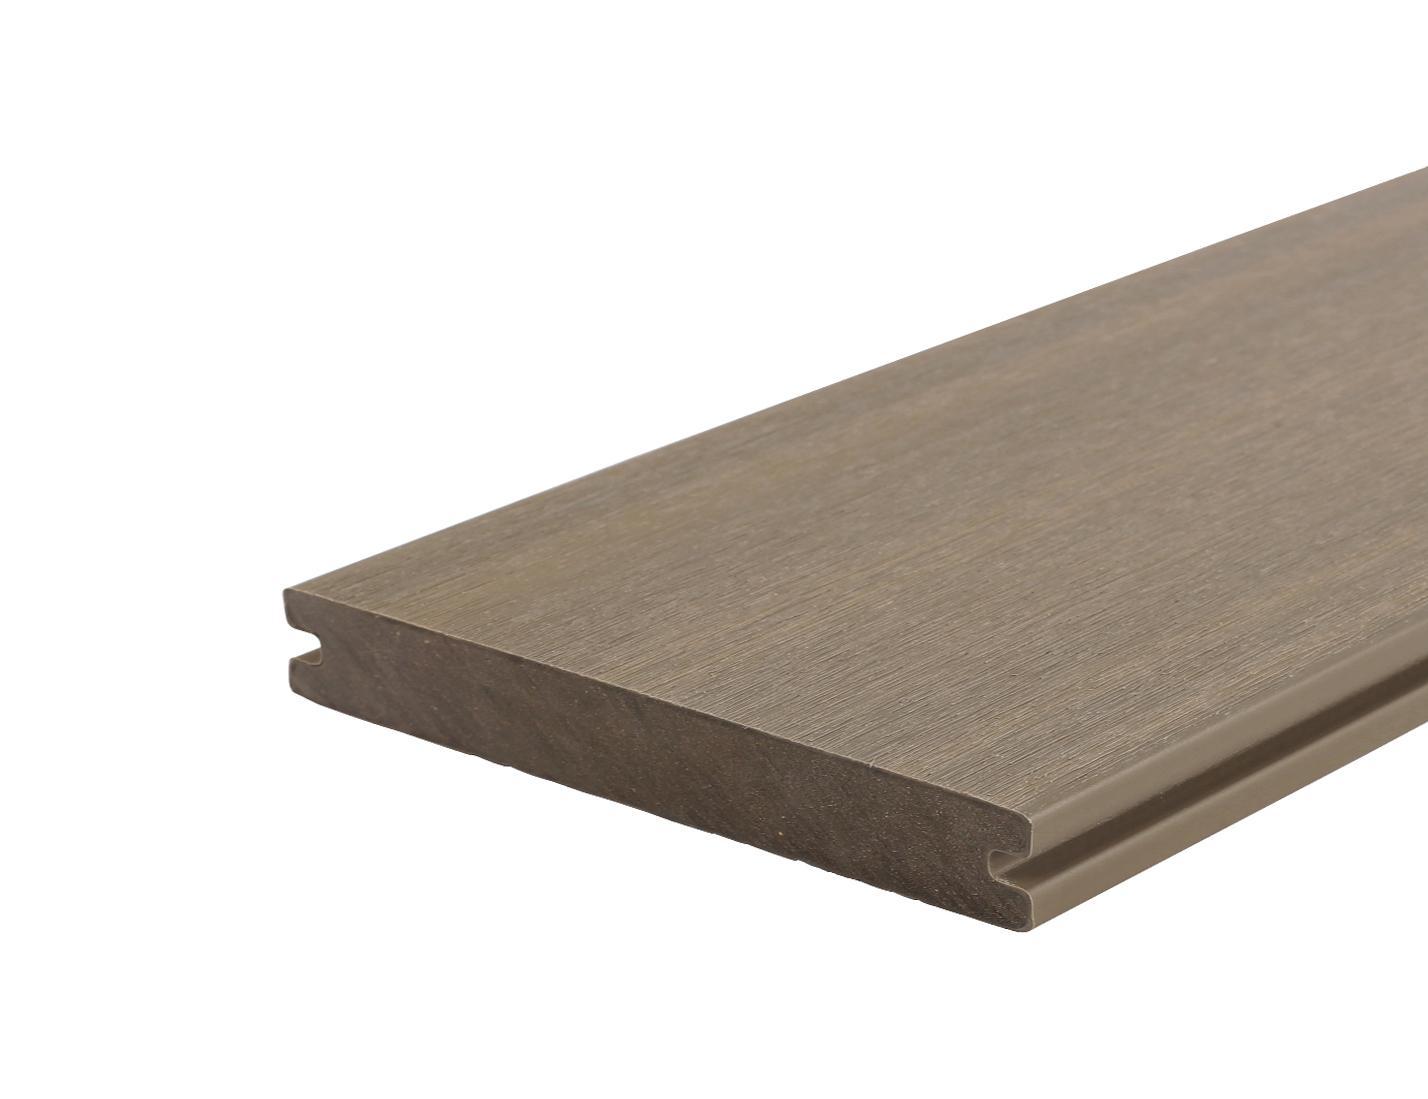 Westwood | Starline vlonderplank 23x210 mm | Multigrey light 400 cm